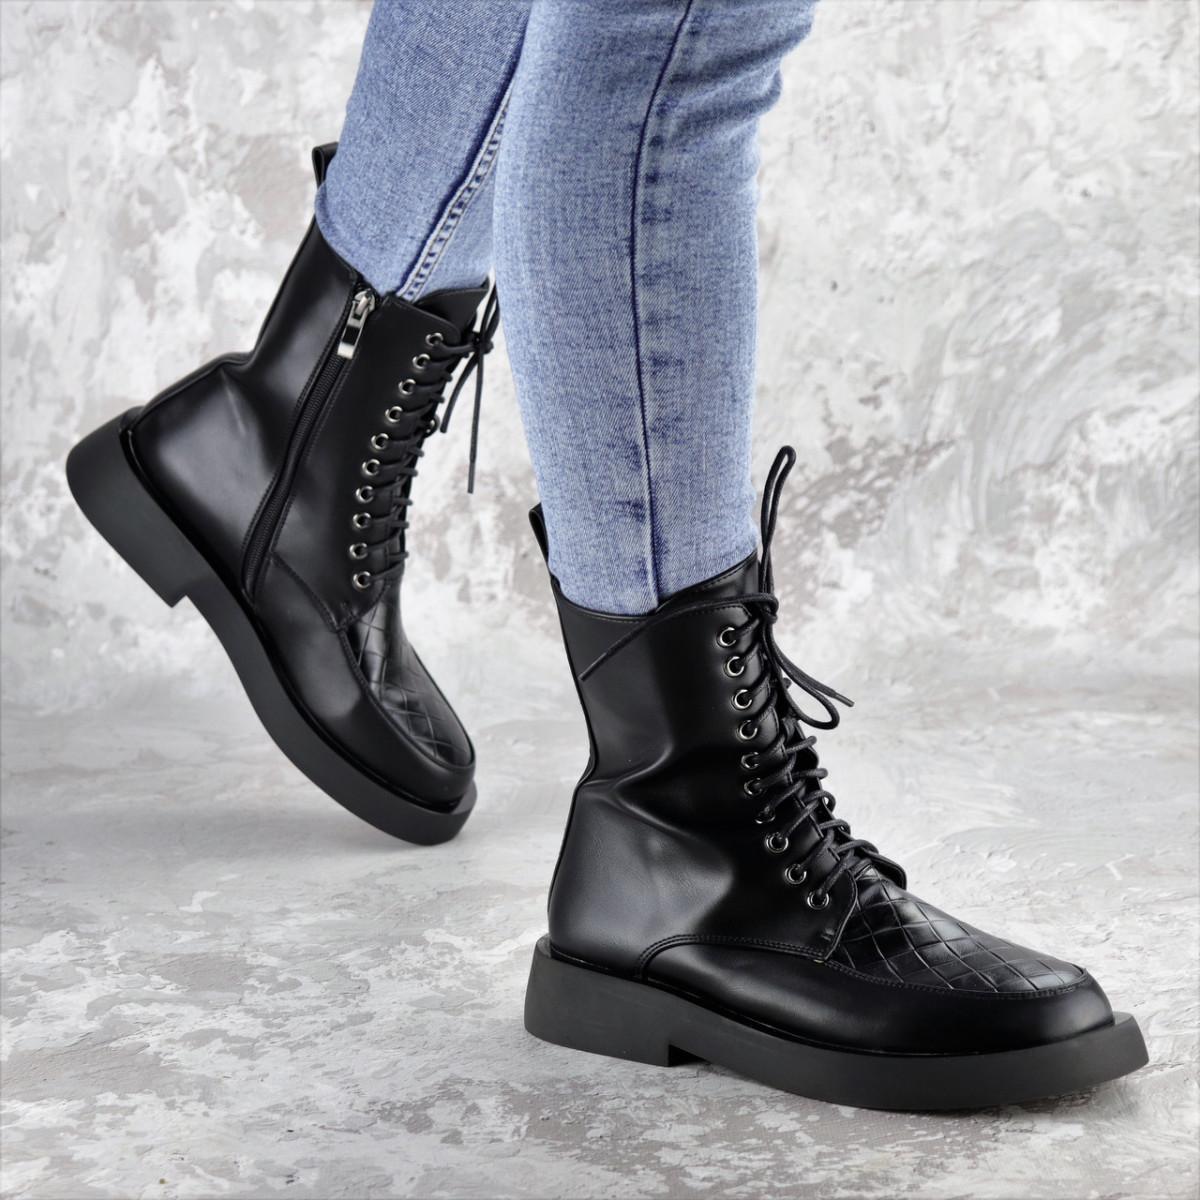 Ботинки женские черные Tootsie 2409 (36 размер)